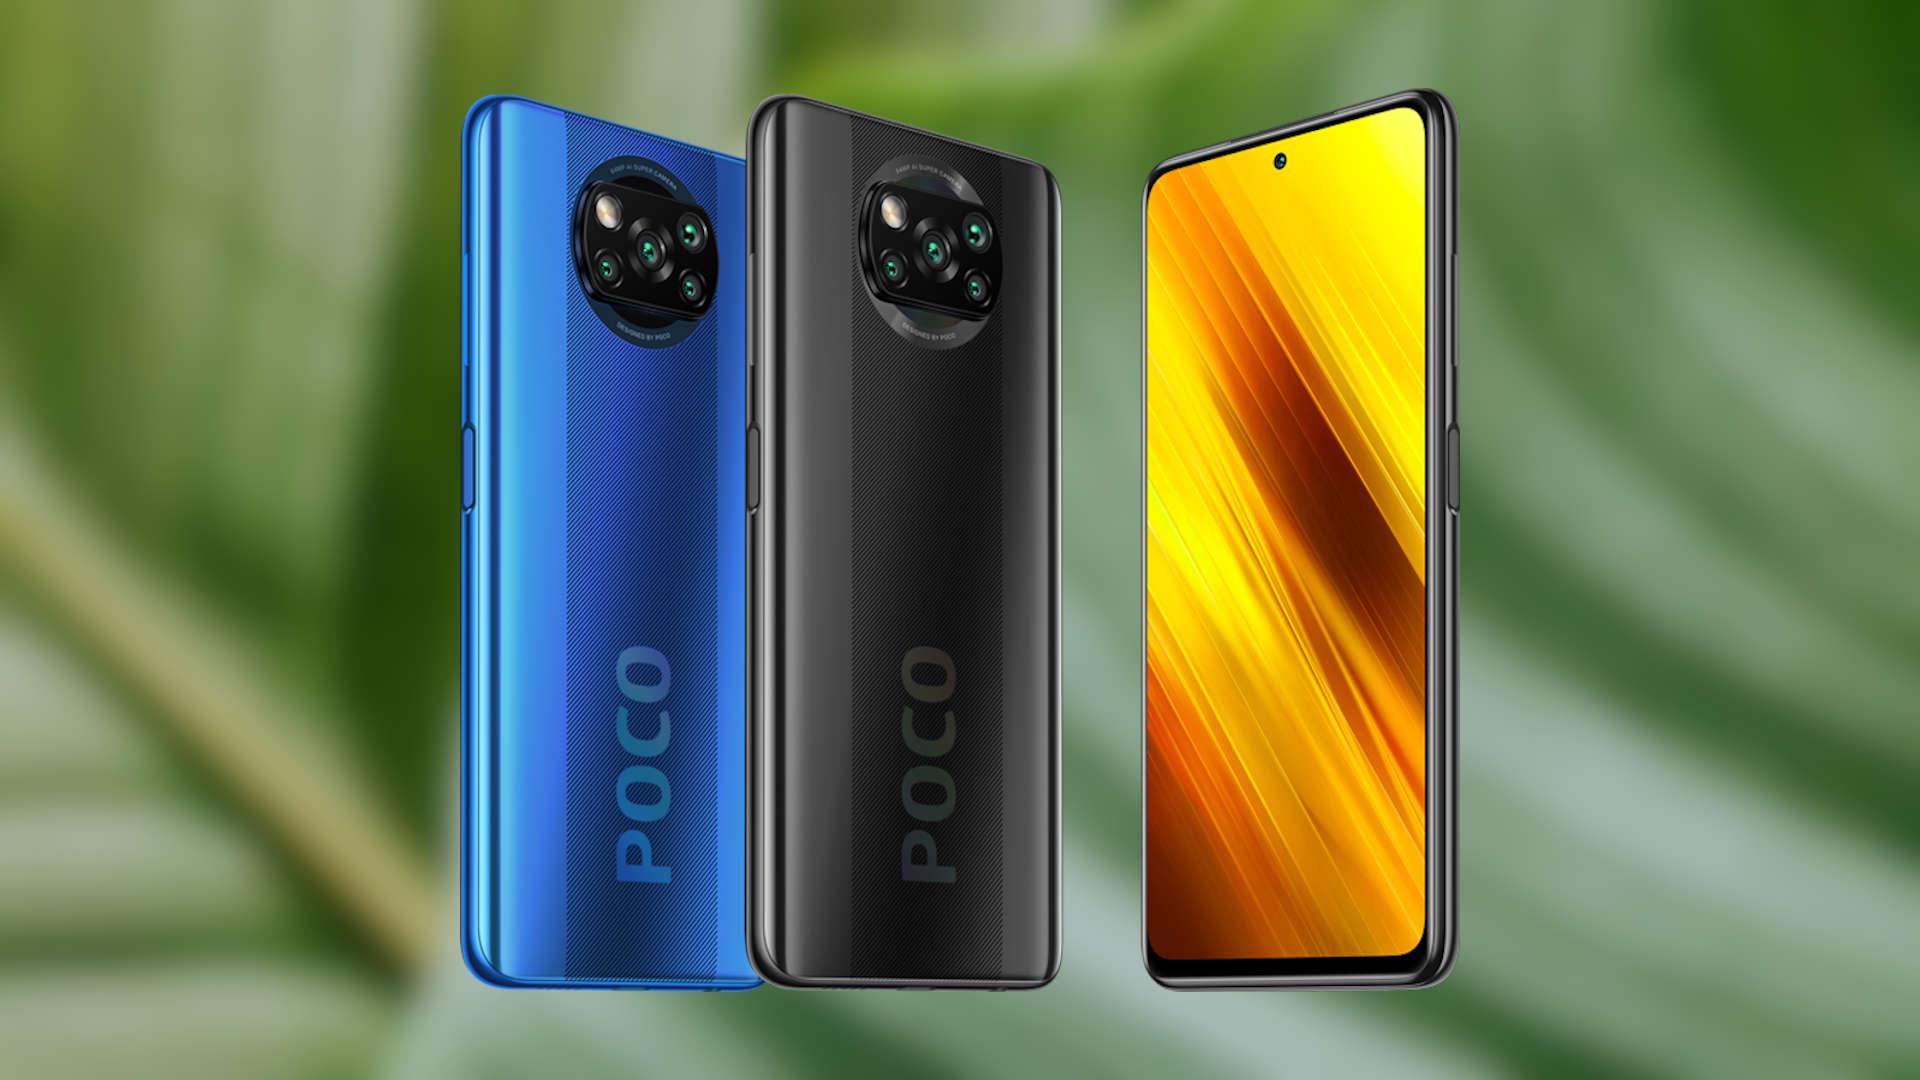 POCO X3 NFC: лучшие обложки, пленки и аксессуары - GizChina.it